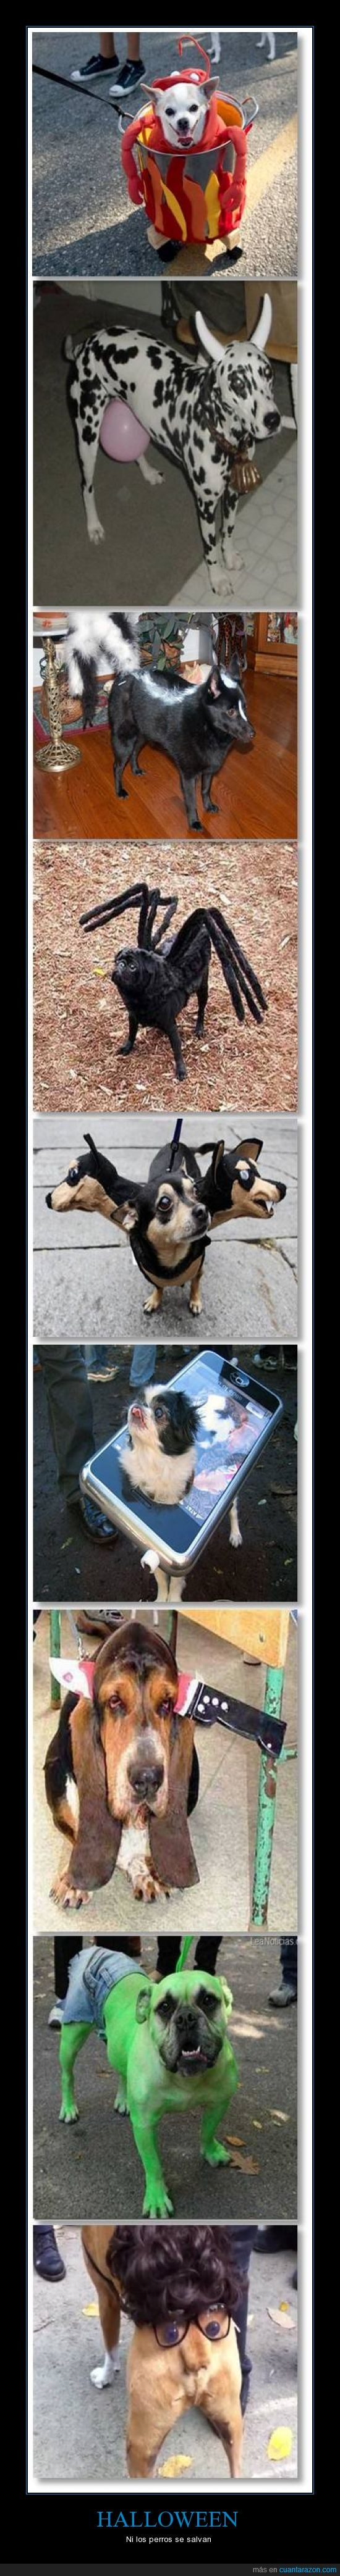 Disfraz,Halloween,Mascotas,Perro